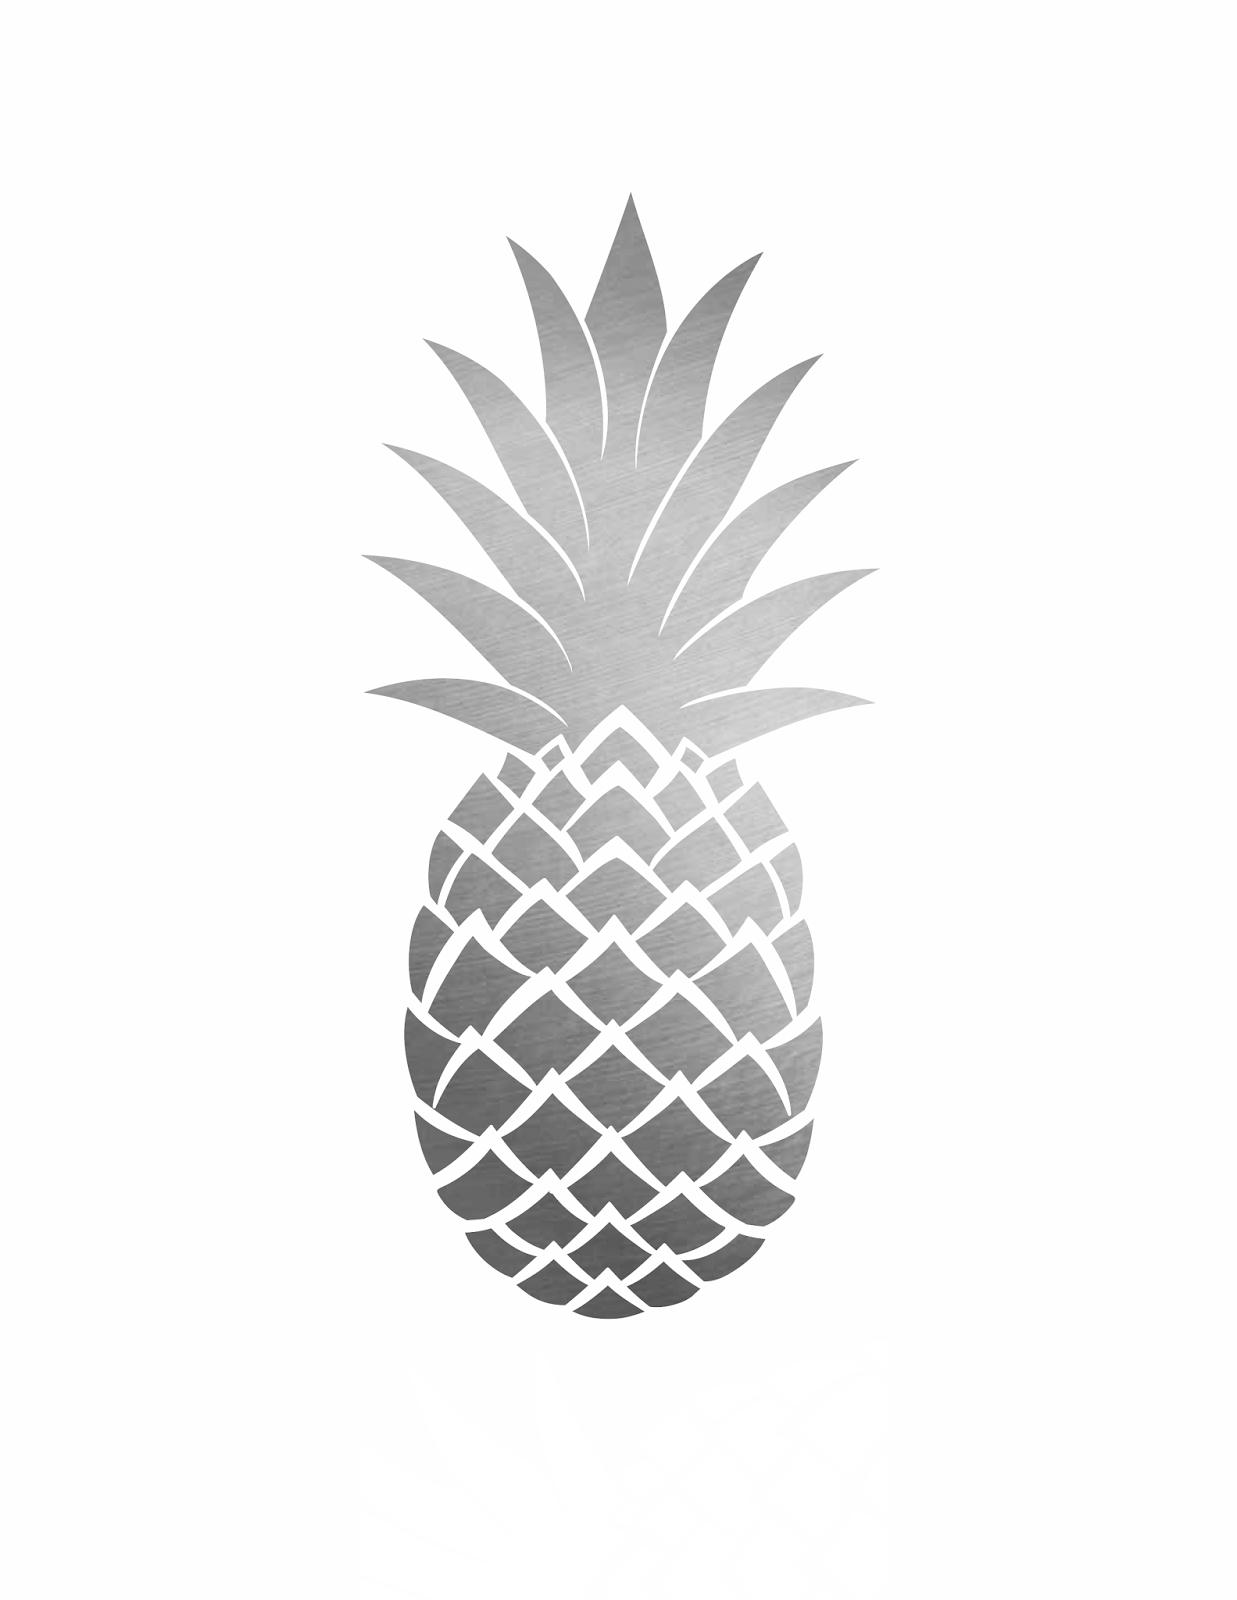 Tumblr Transparent Pineapple